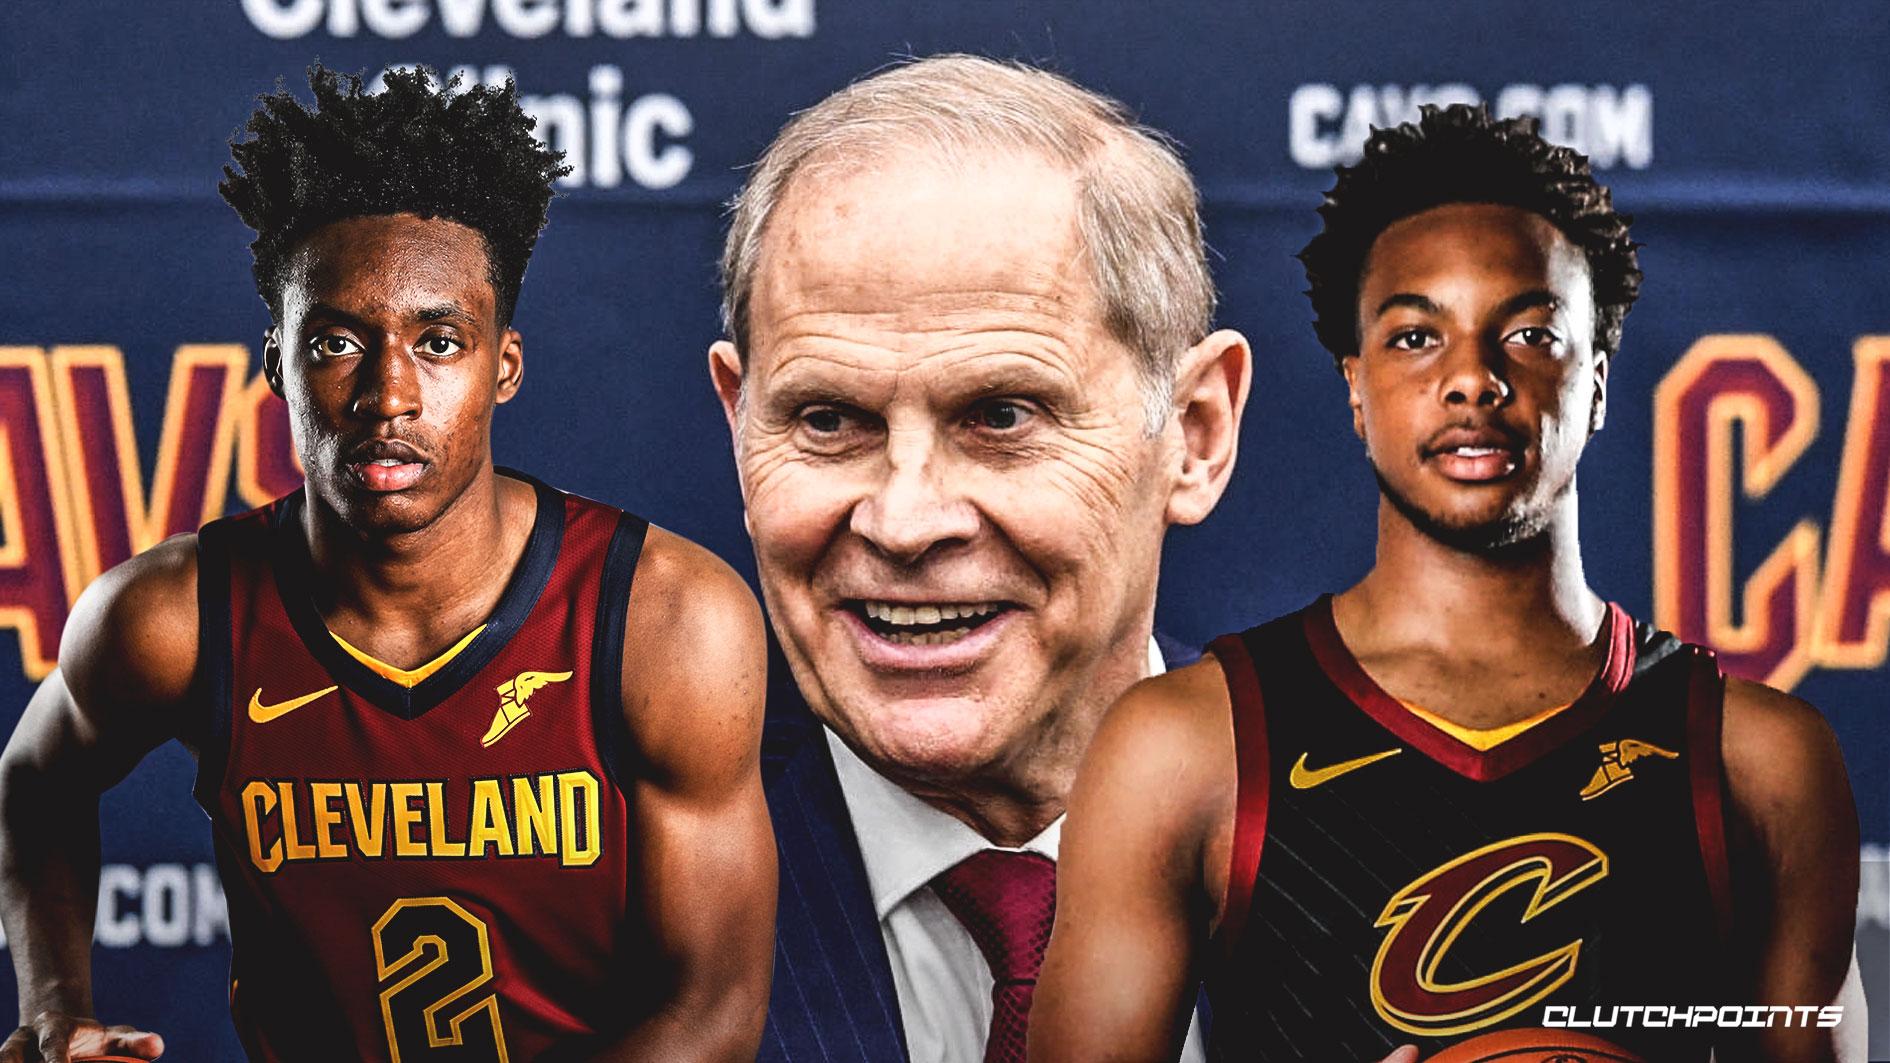 Cavs, 2019-20 NBA Season